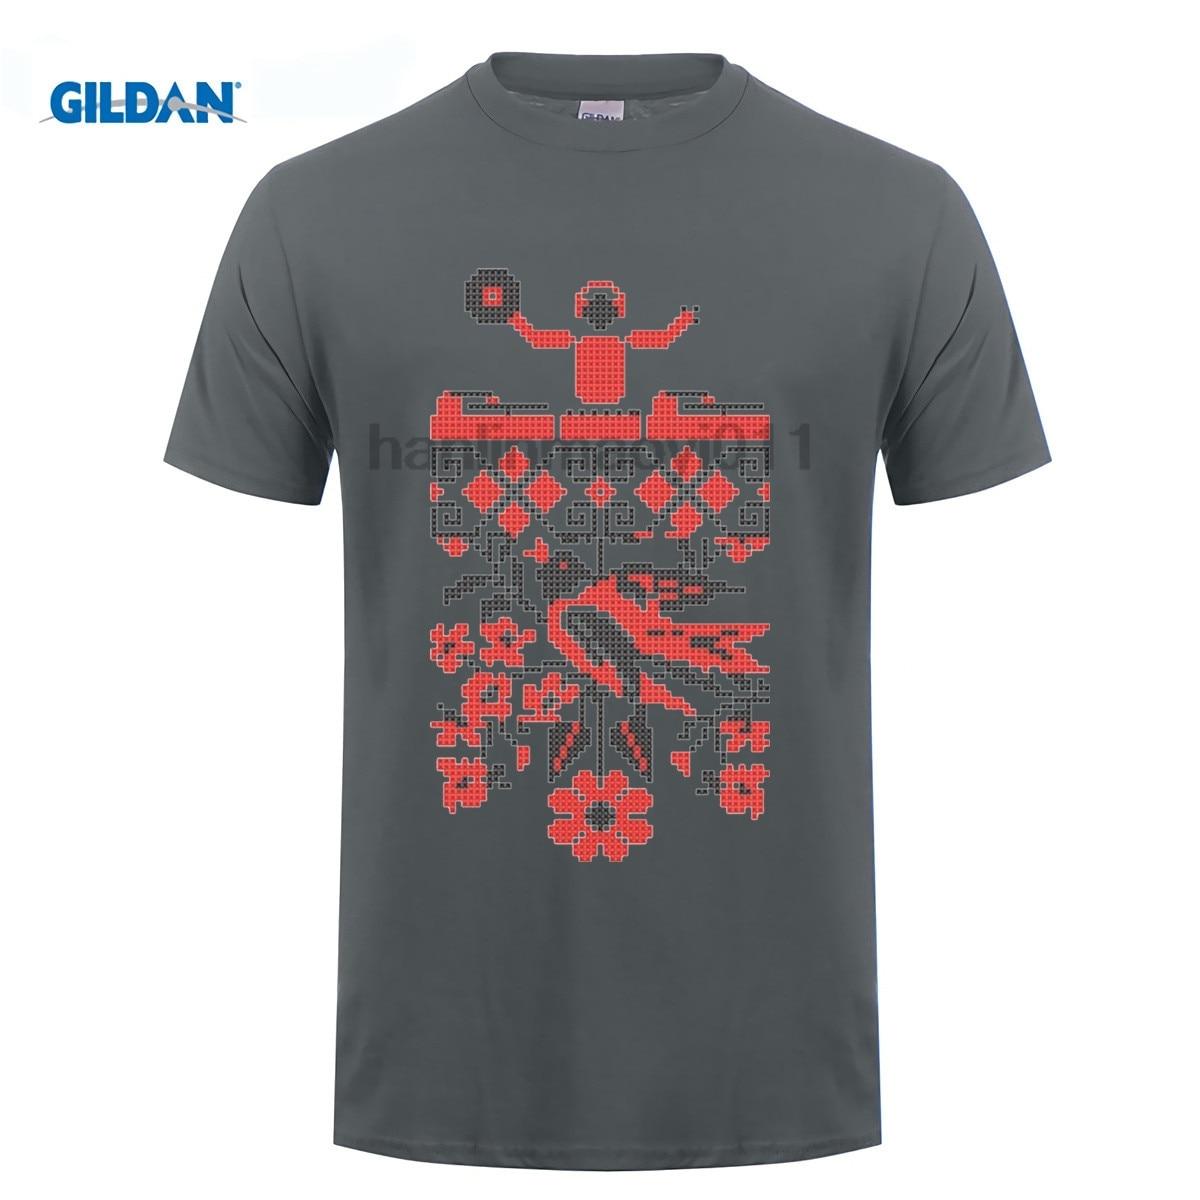 GILDAN Discount Ukrainian Ethno DJ Men s t shirt for Sale boys Pre cotton t  shirts-in T-Shirts from Men s Clothing   Accessories on Aliexpress.com  adb7964d4